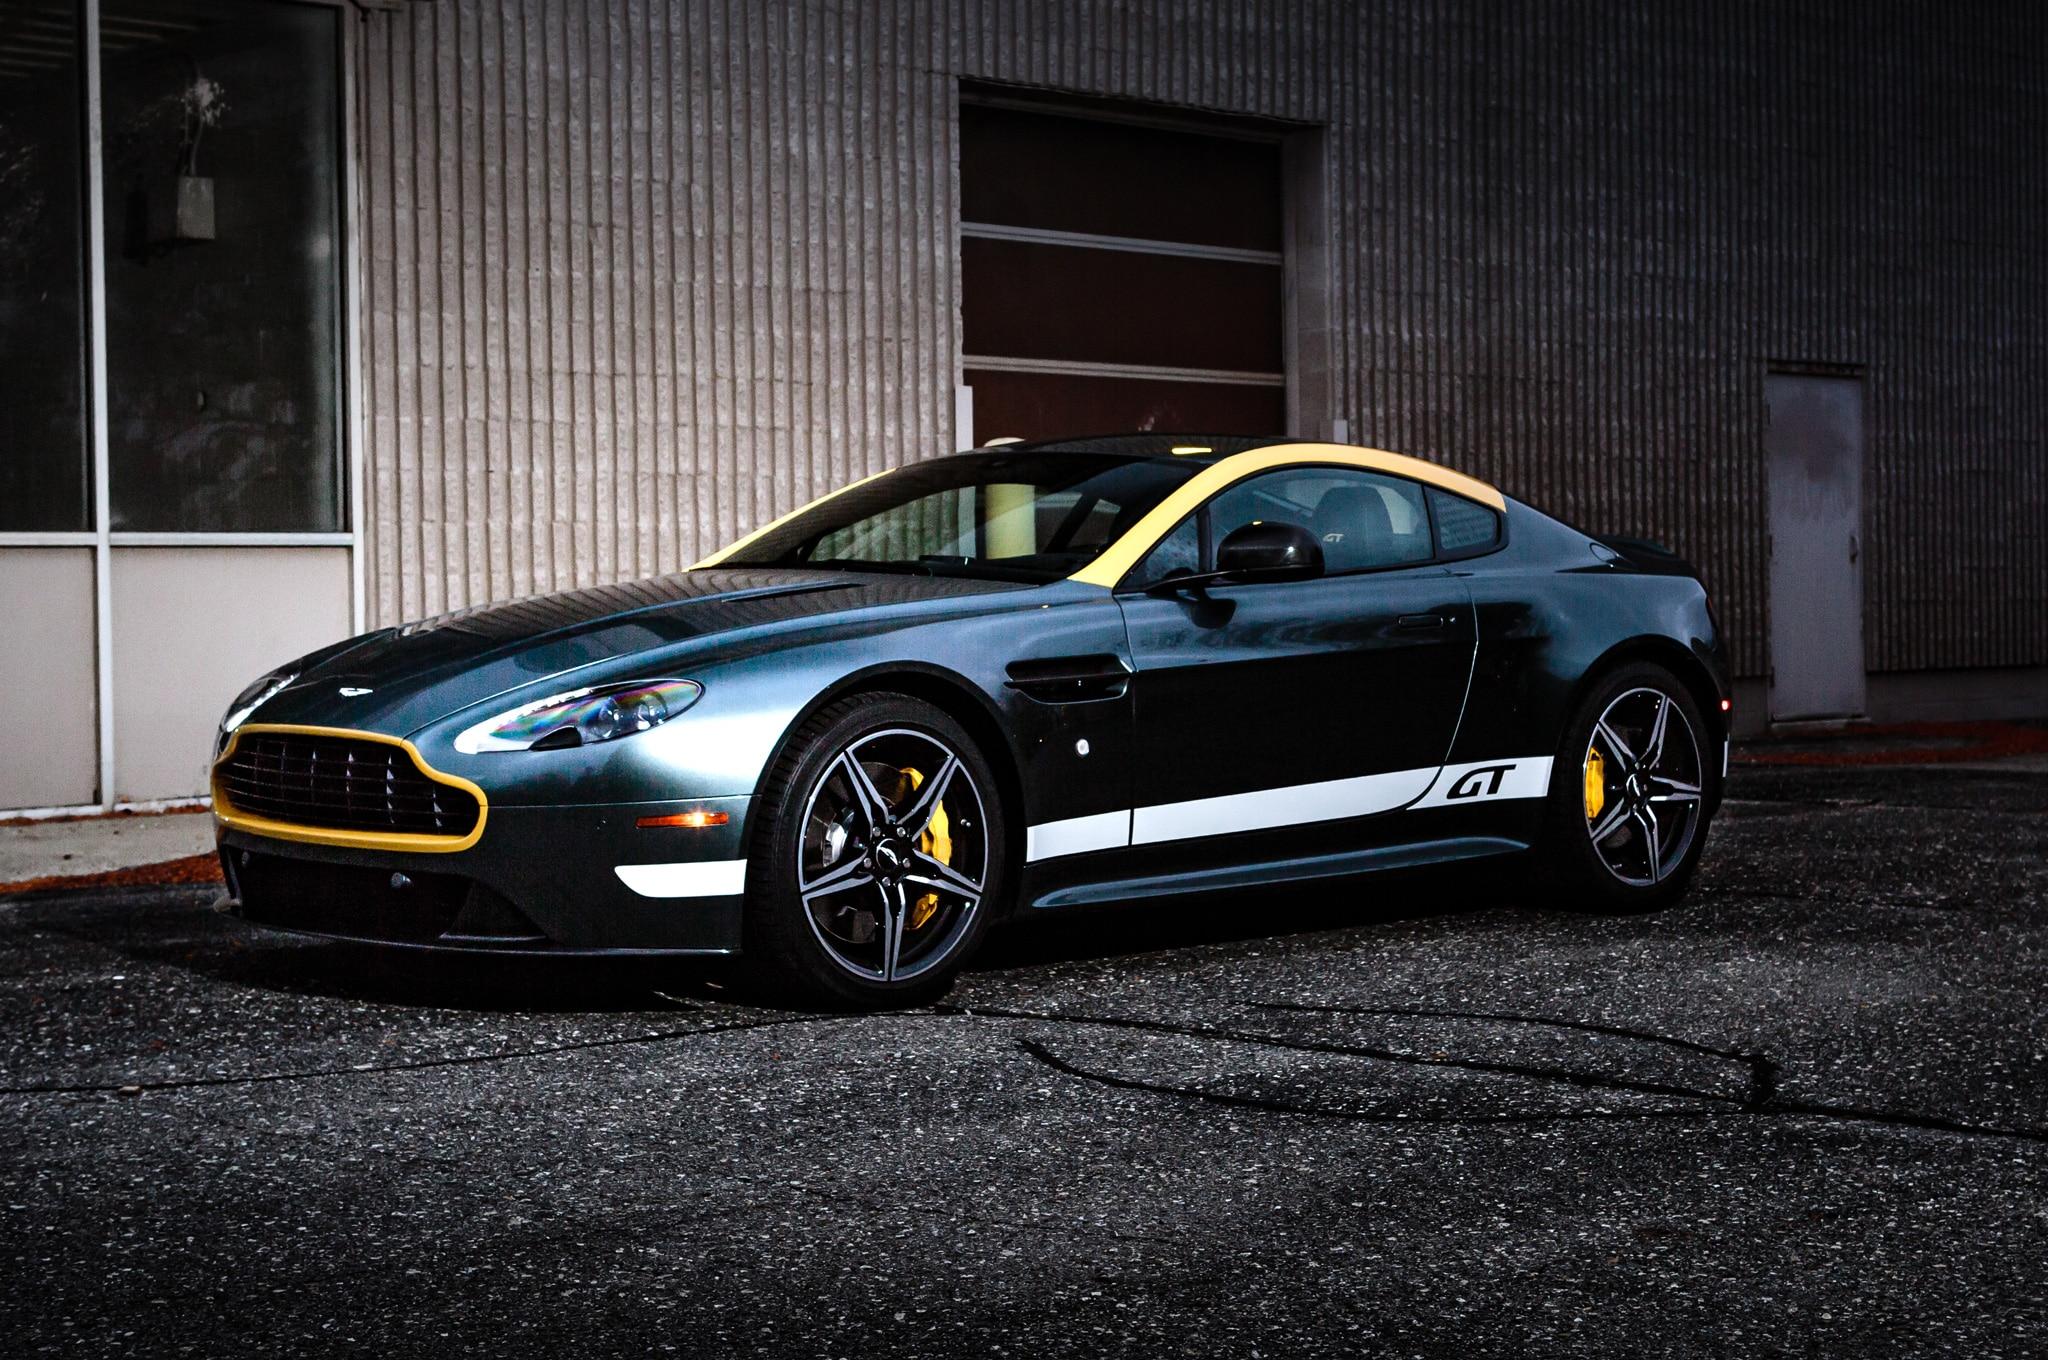 2016 Aston Martin Vantage Gt Review